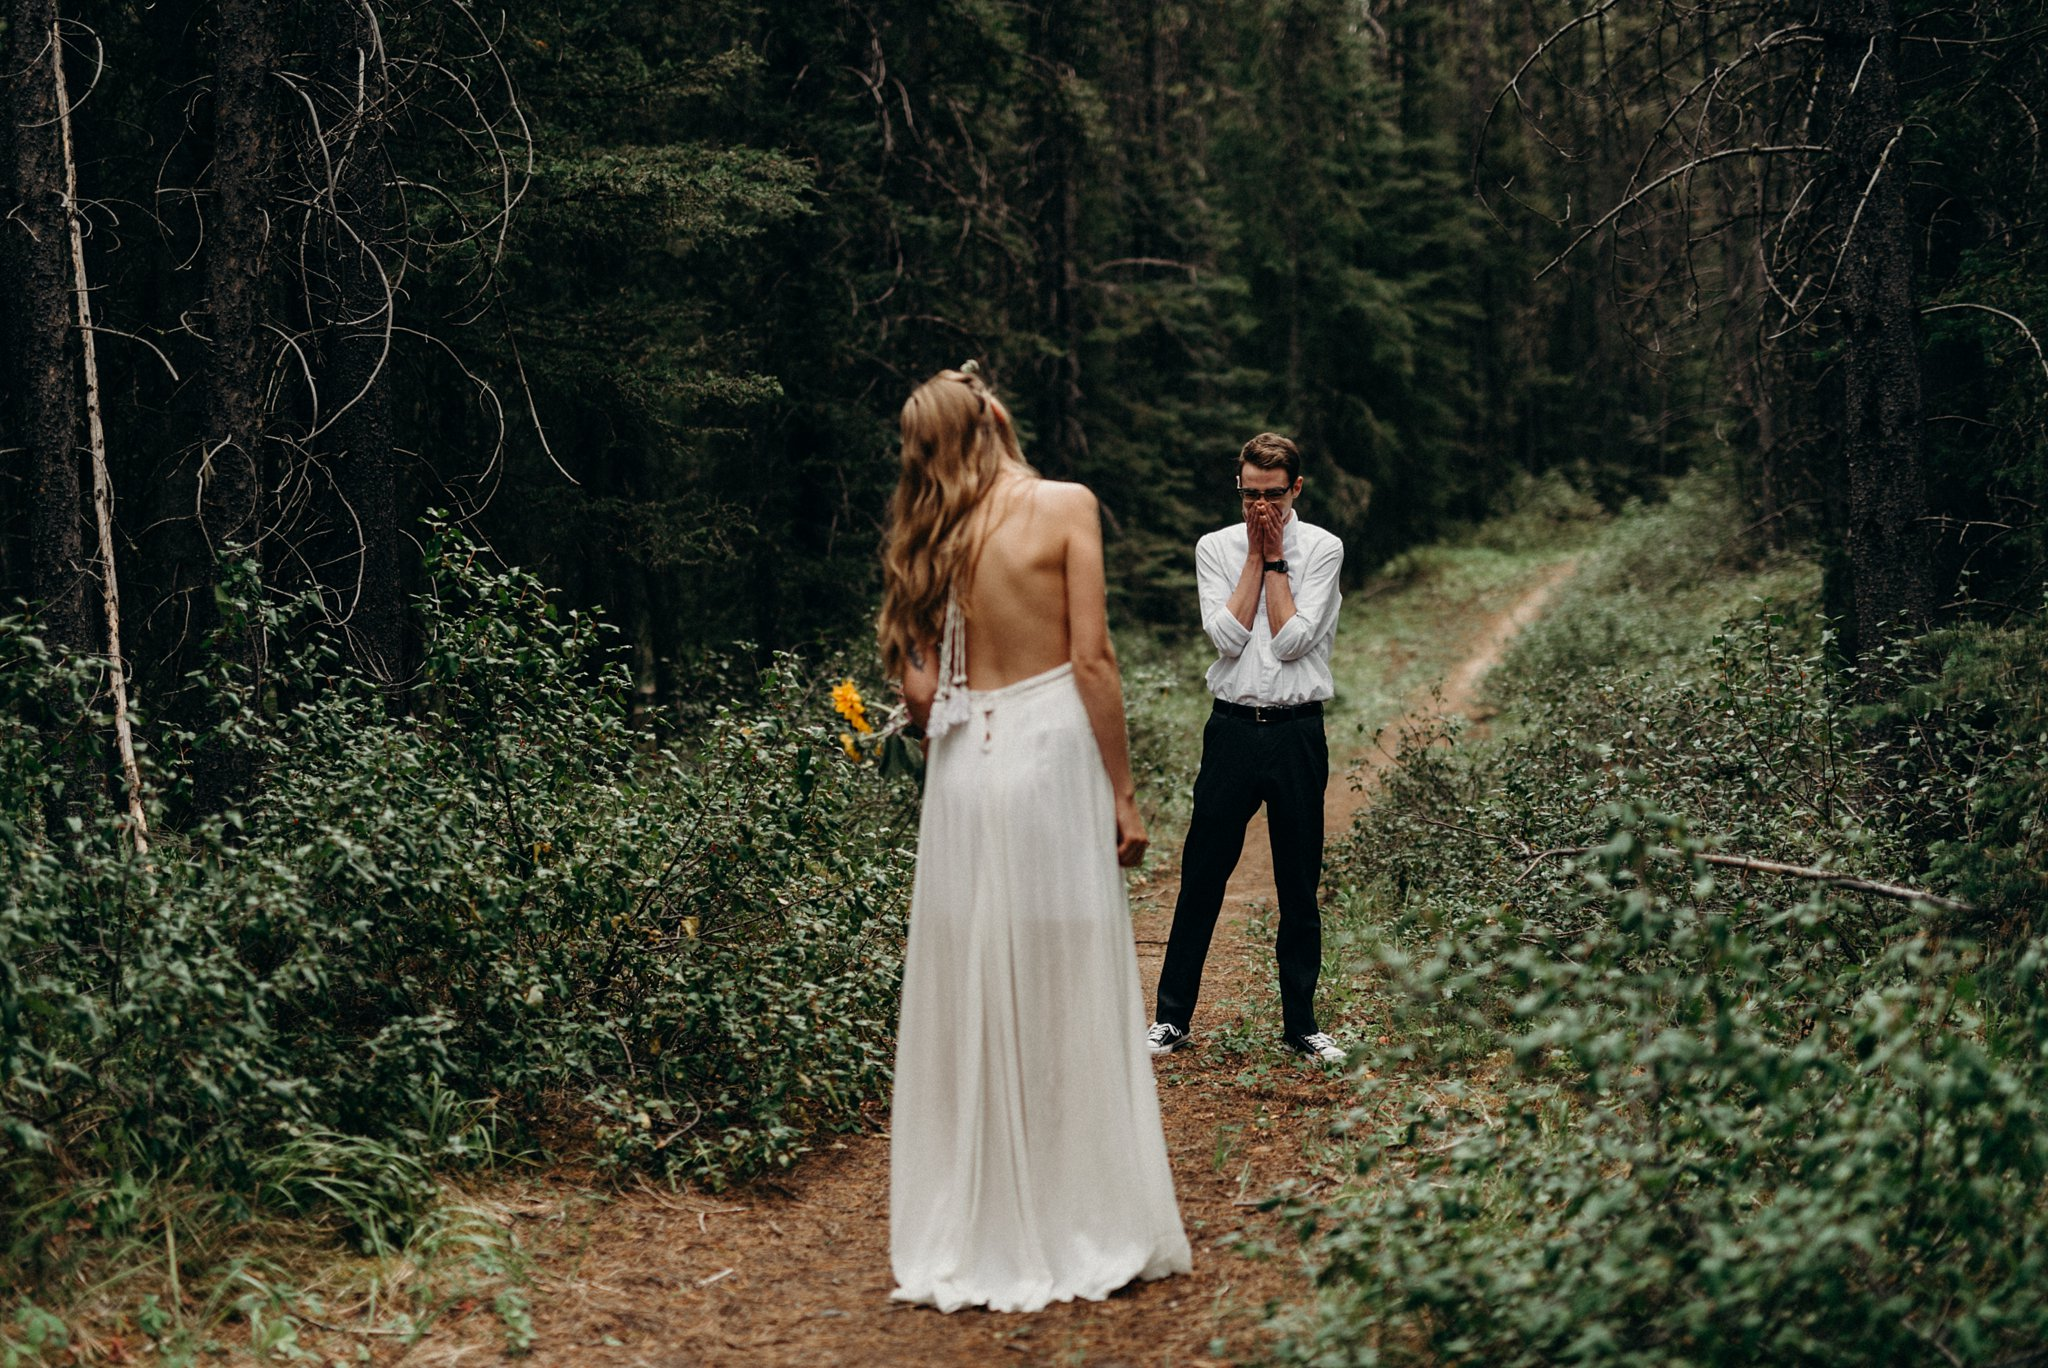 kaihla_tonai_intimate_wedding_elopement_photographer_6363.jpg